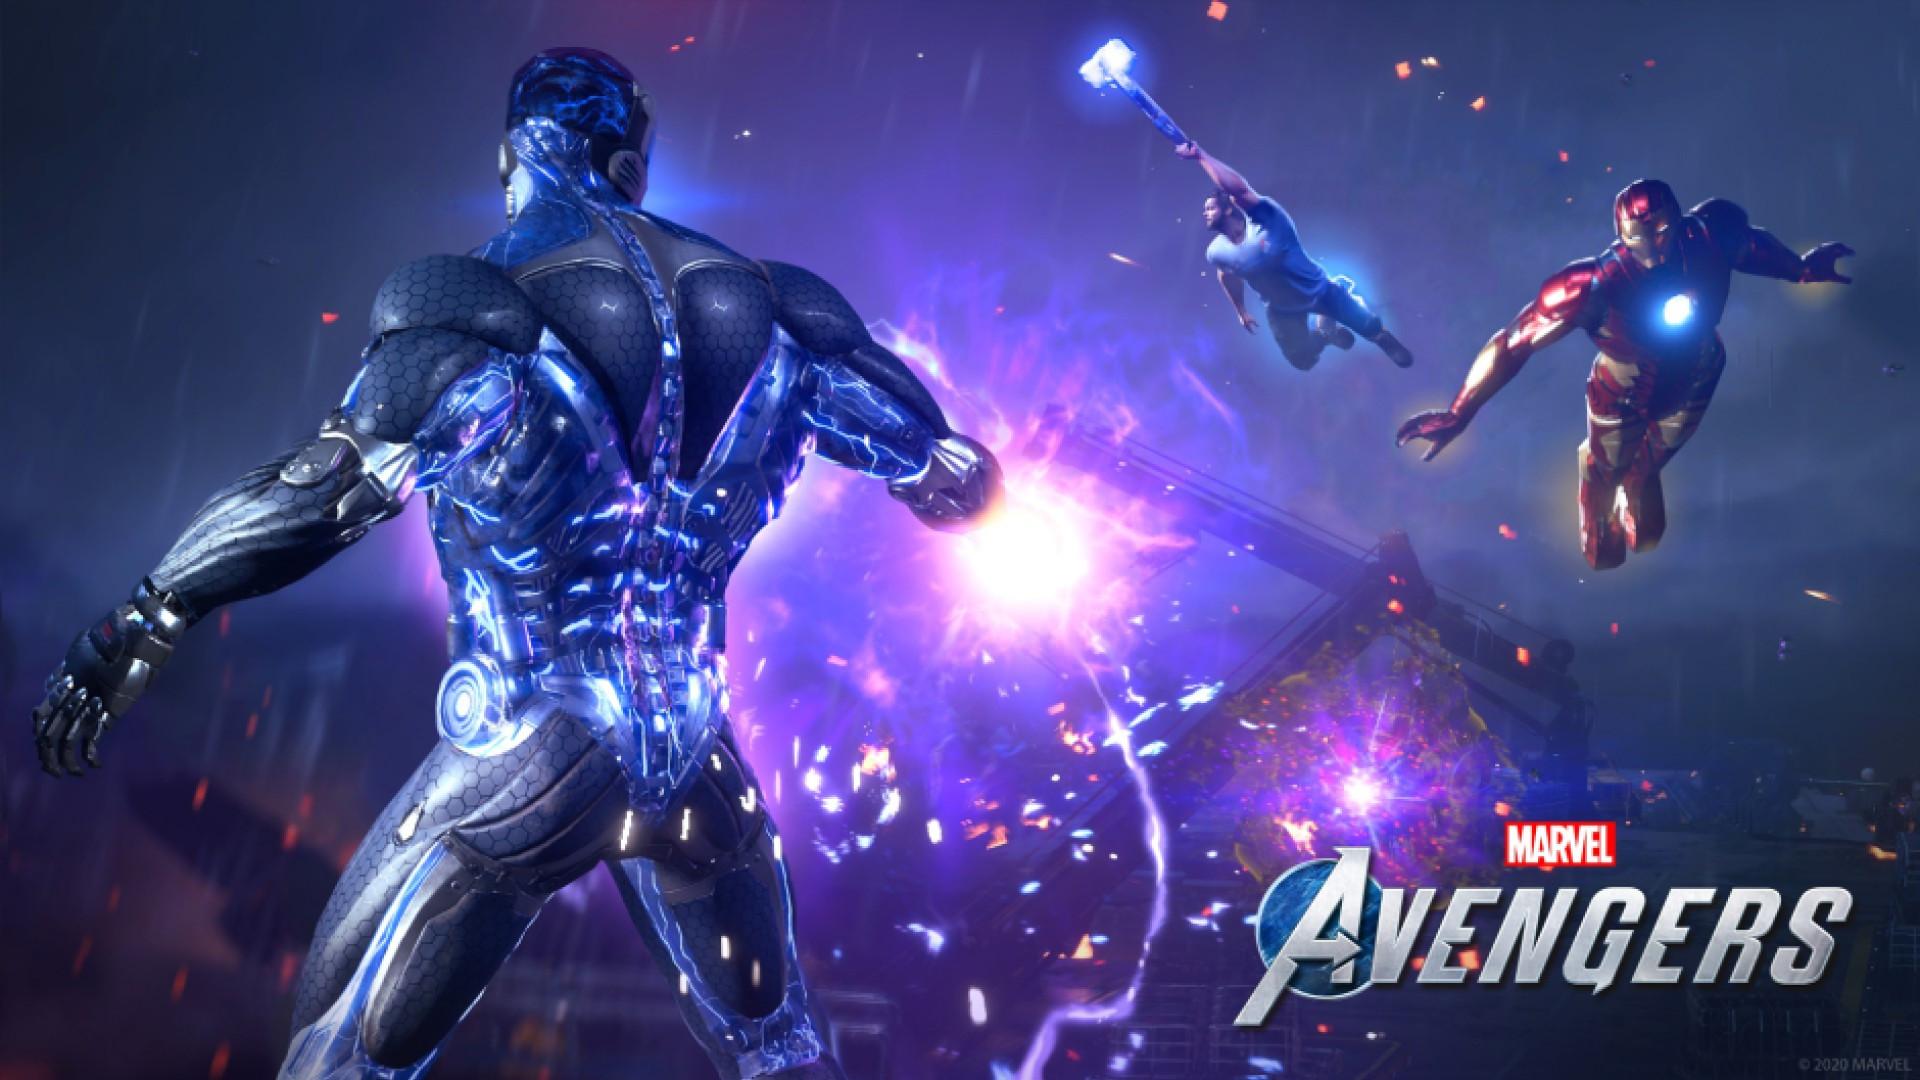 marvels avengers game computer wallpaper 74177